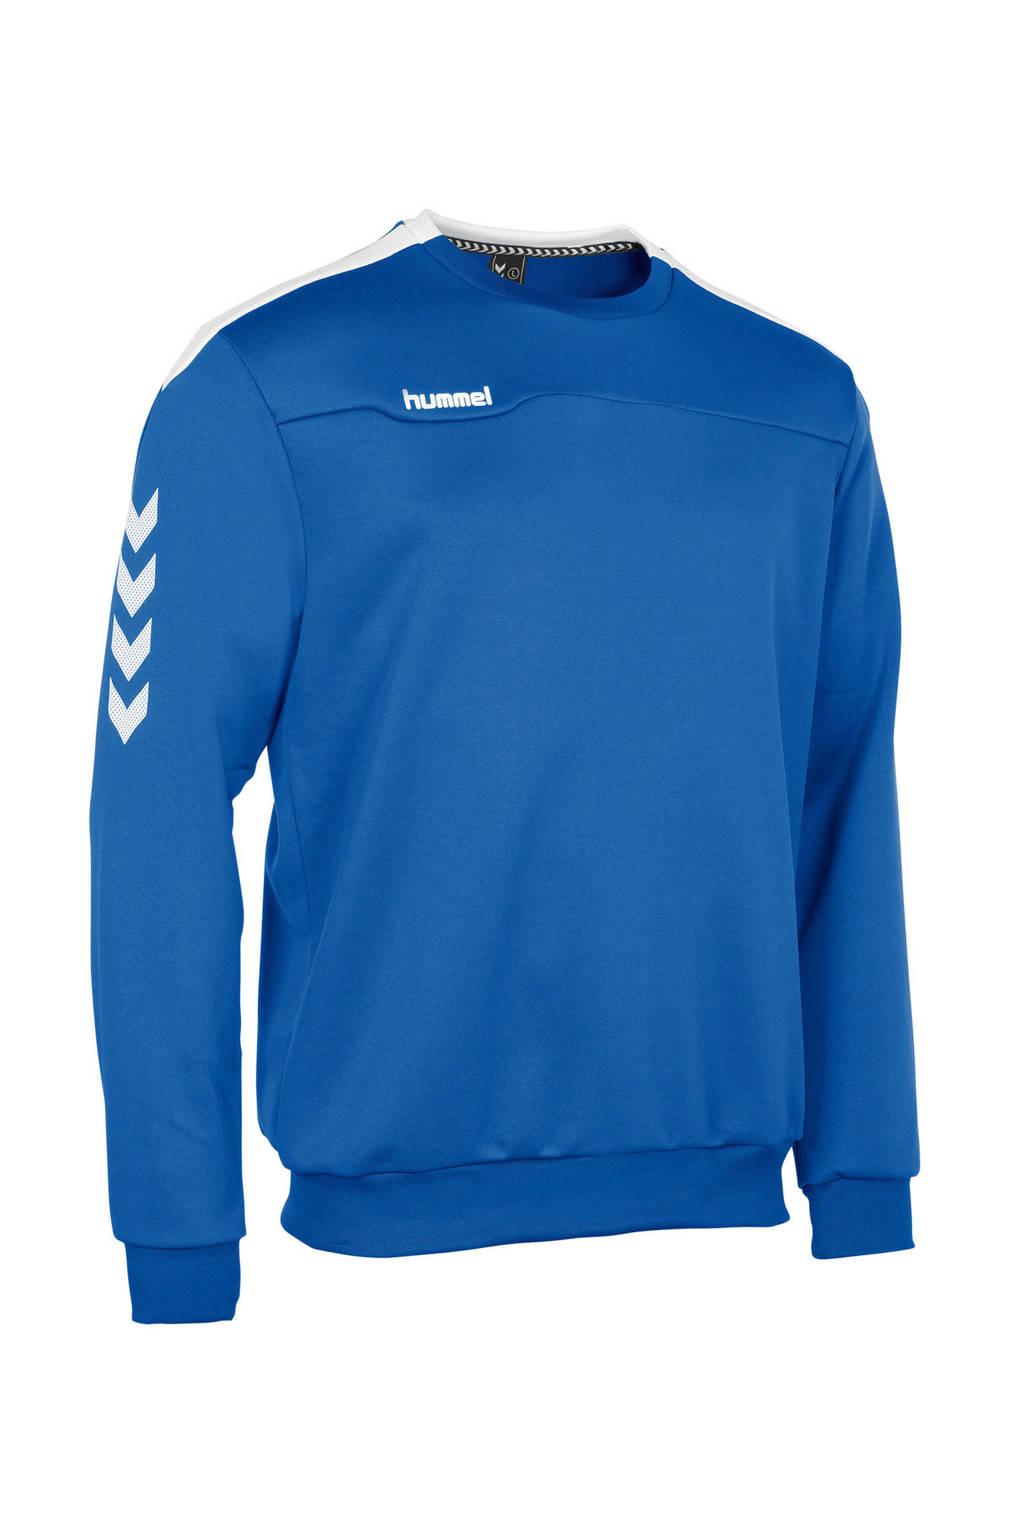 hummel   sportsweater blauw, Blauw/wit, Jongens